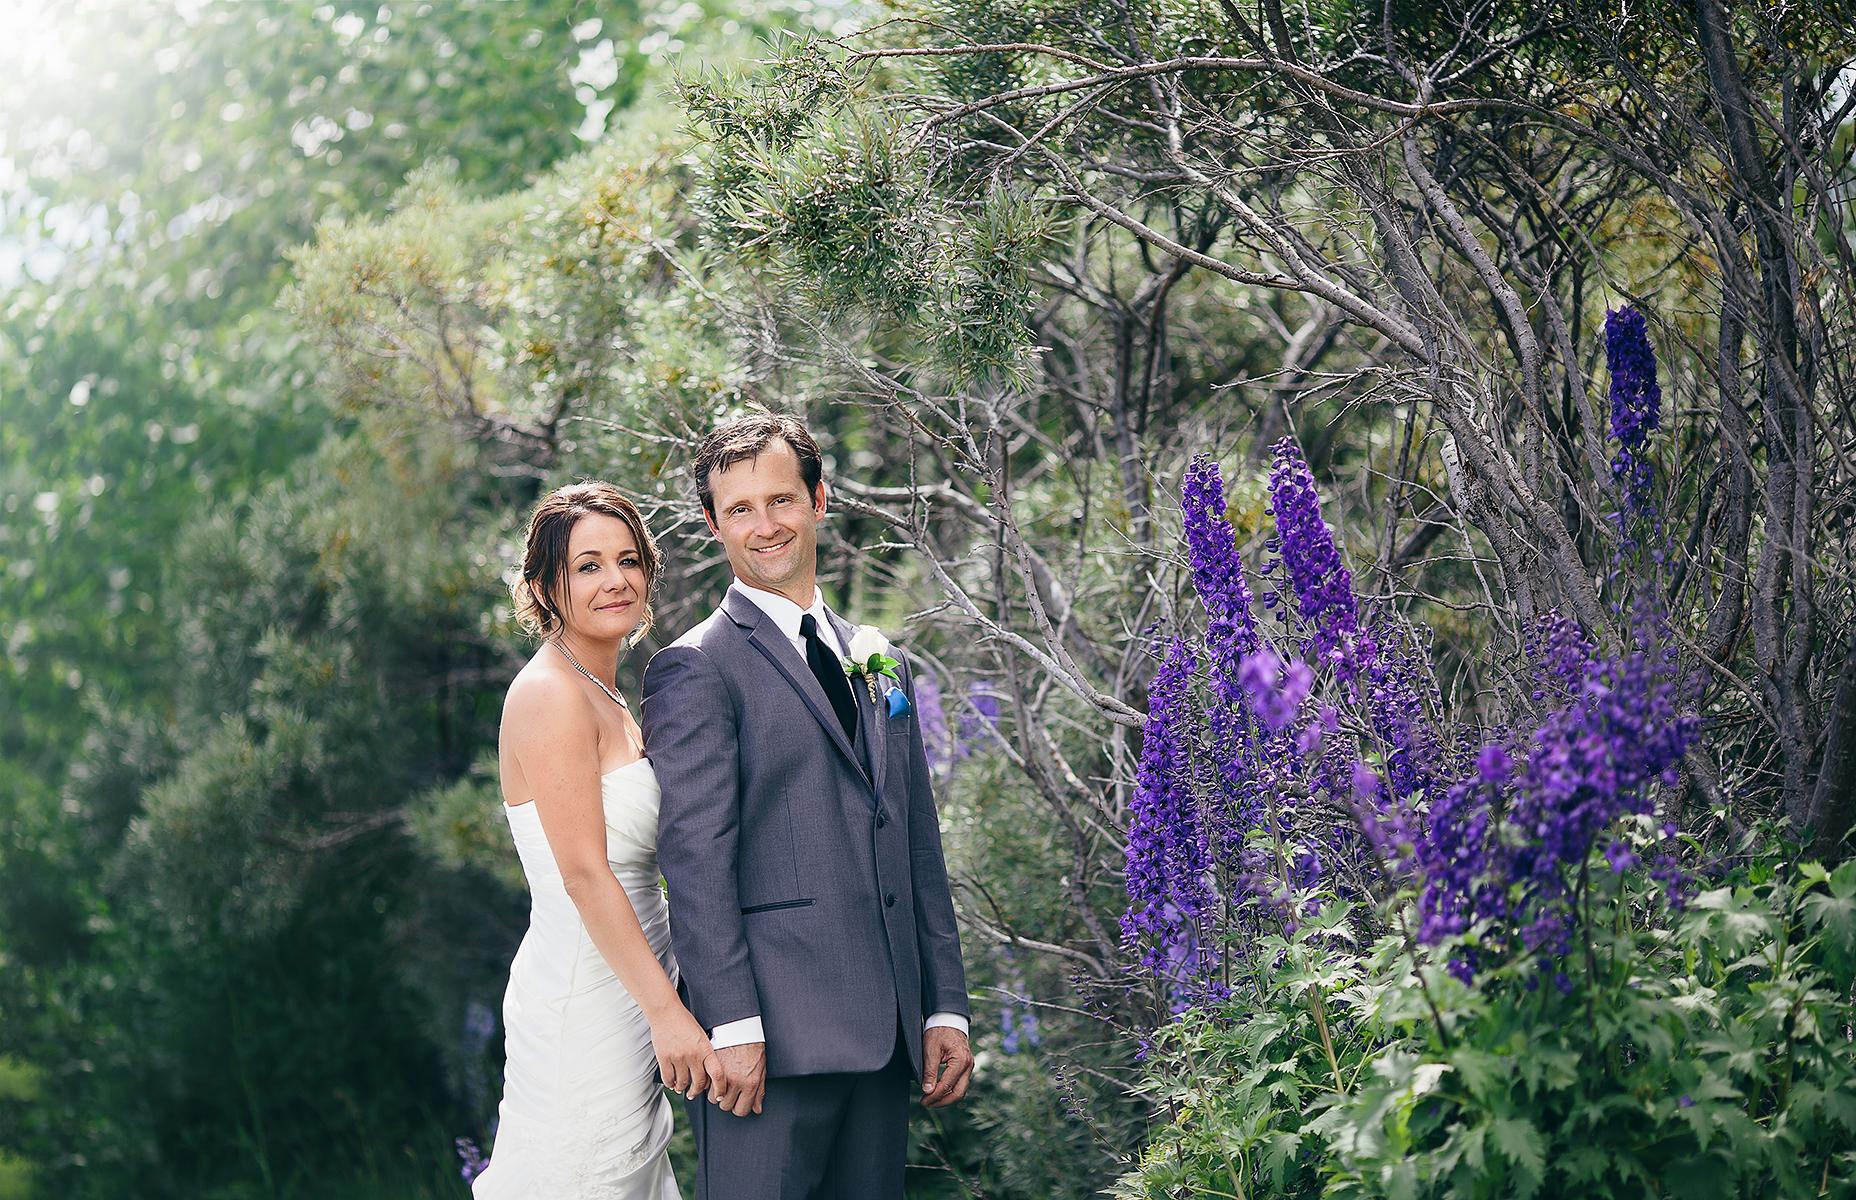 Private land wedding Springbank Calgary Nathalie Terekhova Wedding photographer Calgary